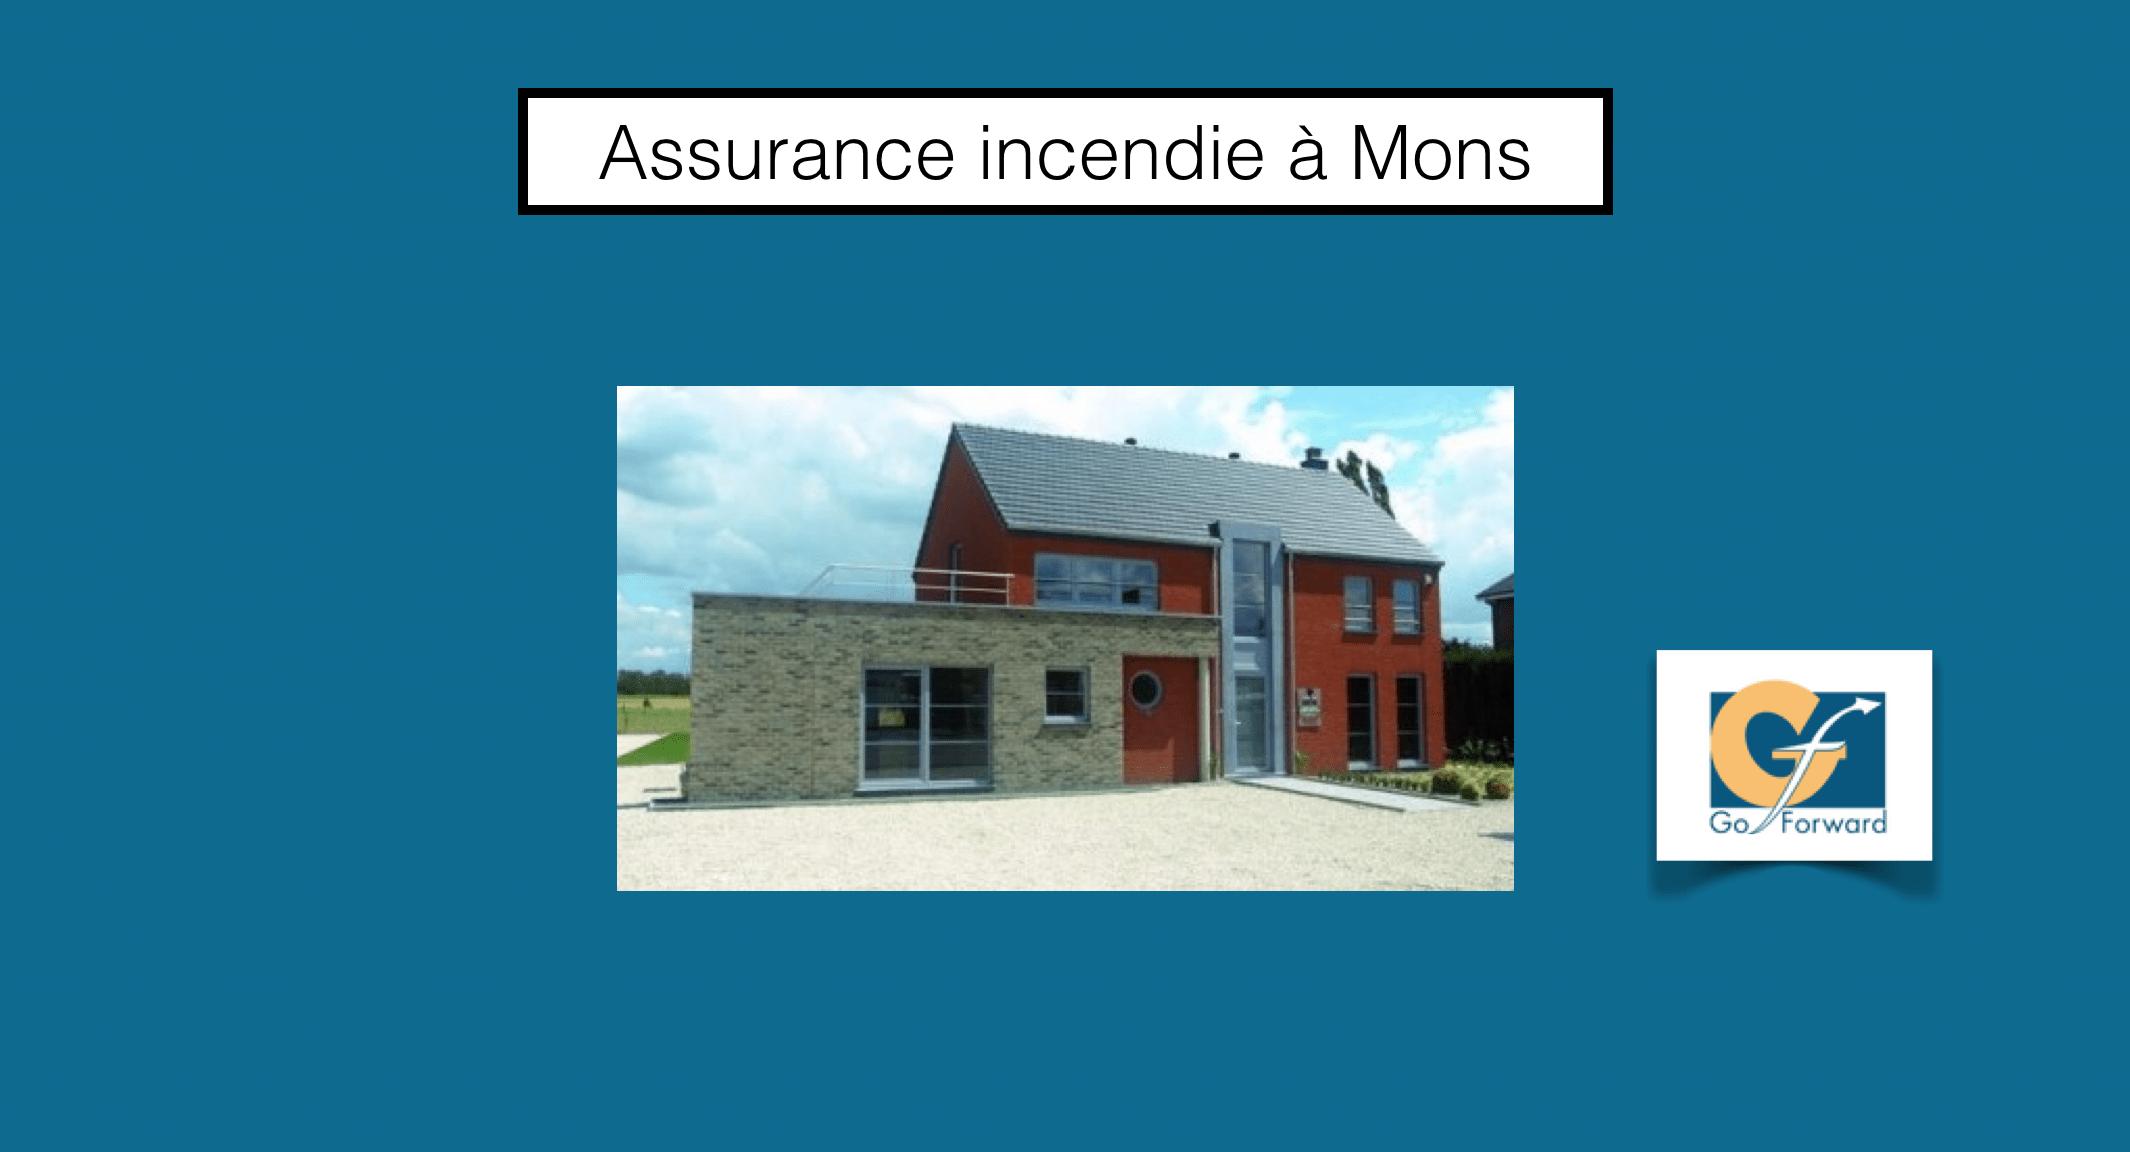 assurance habitation incendie mons go forward